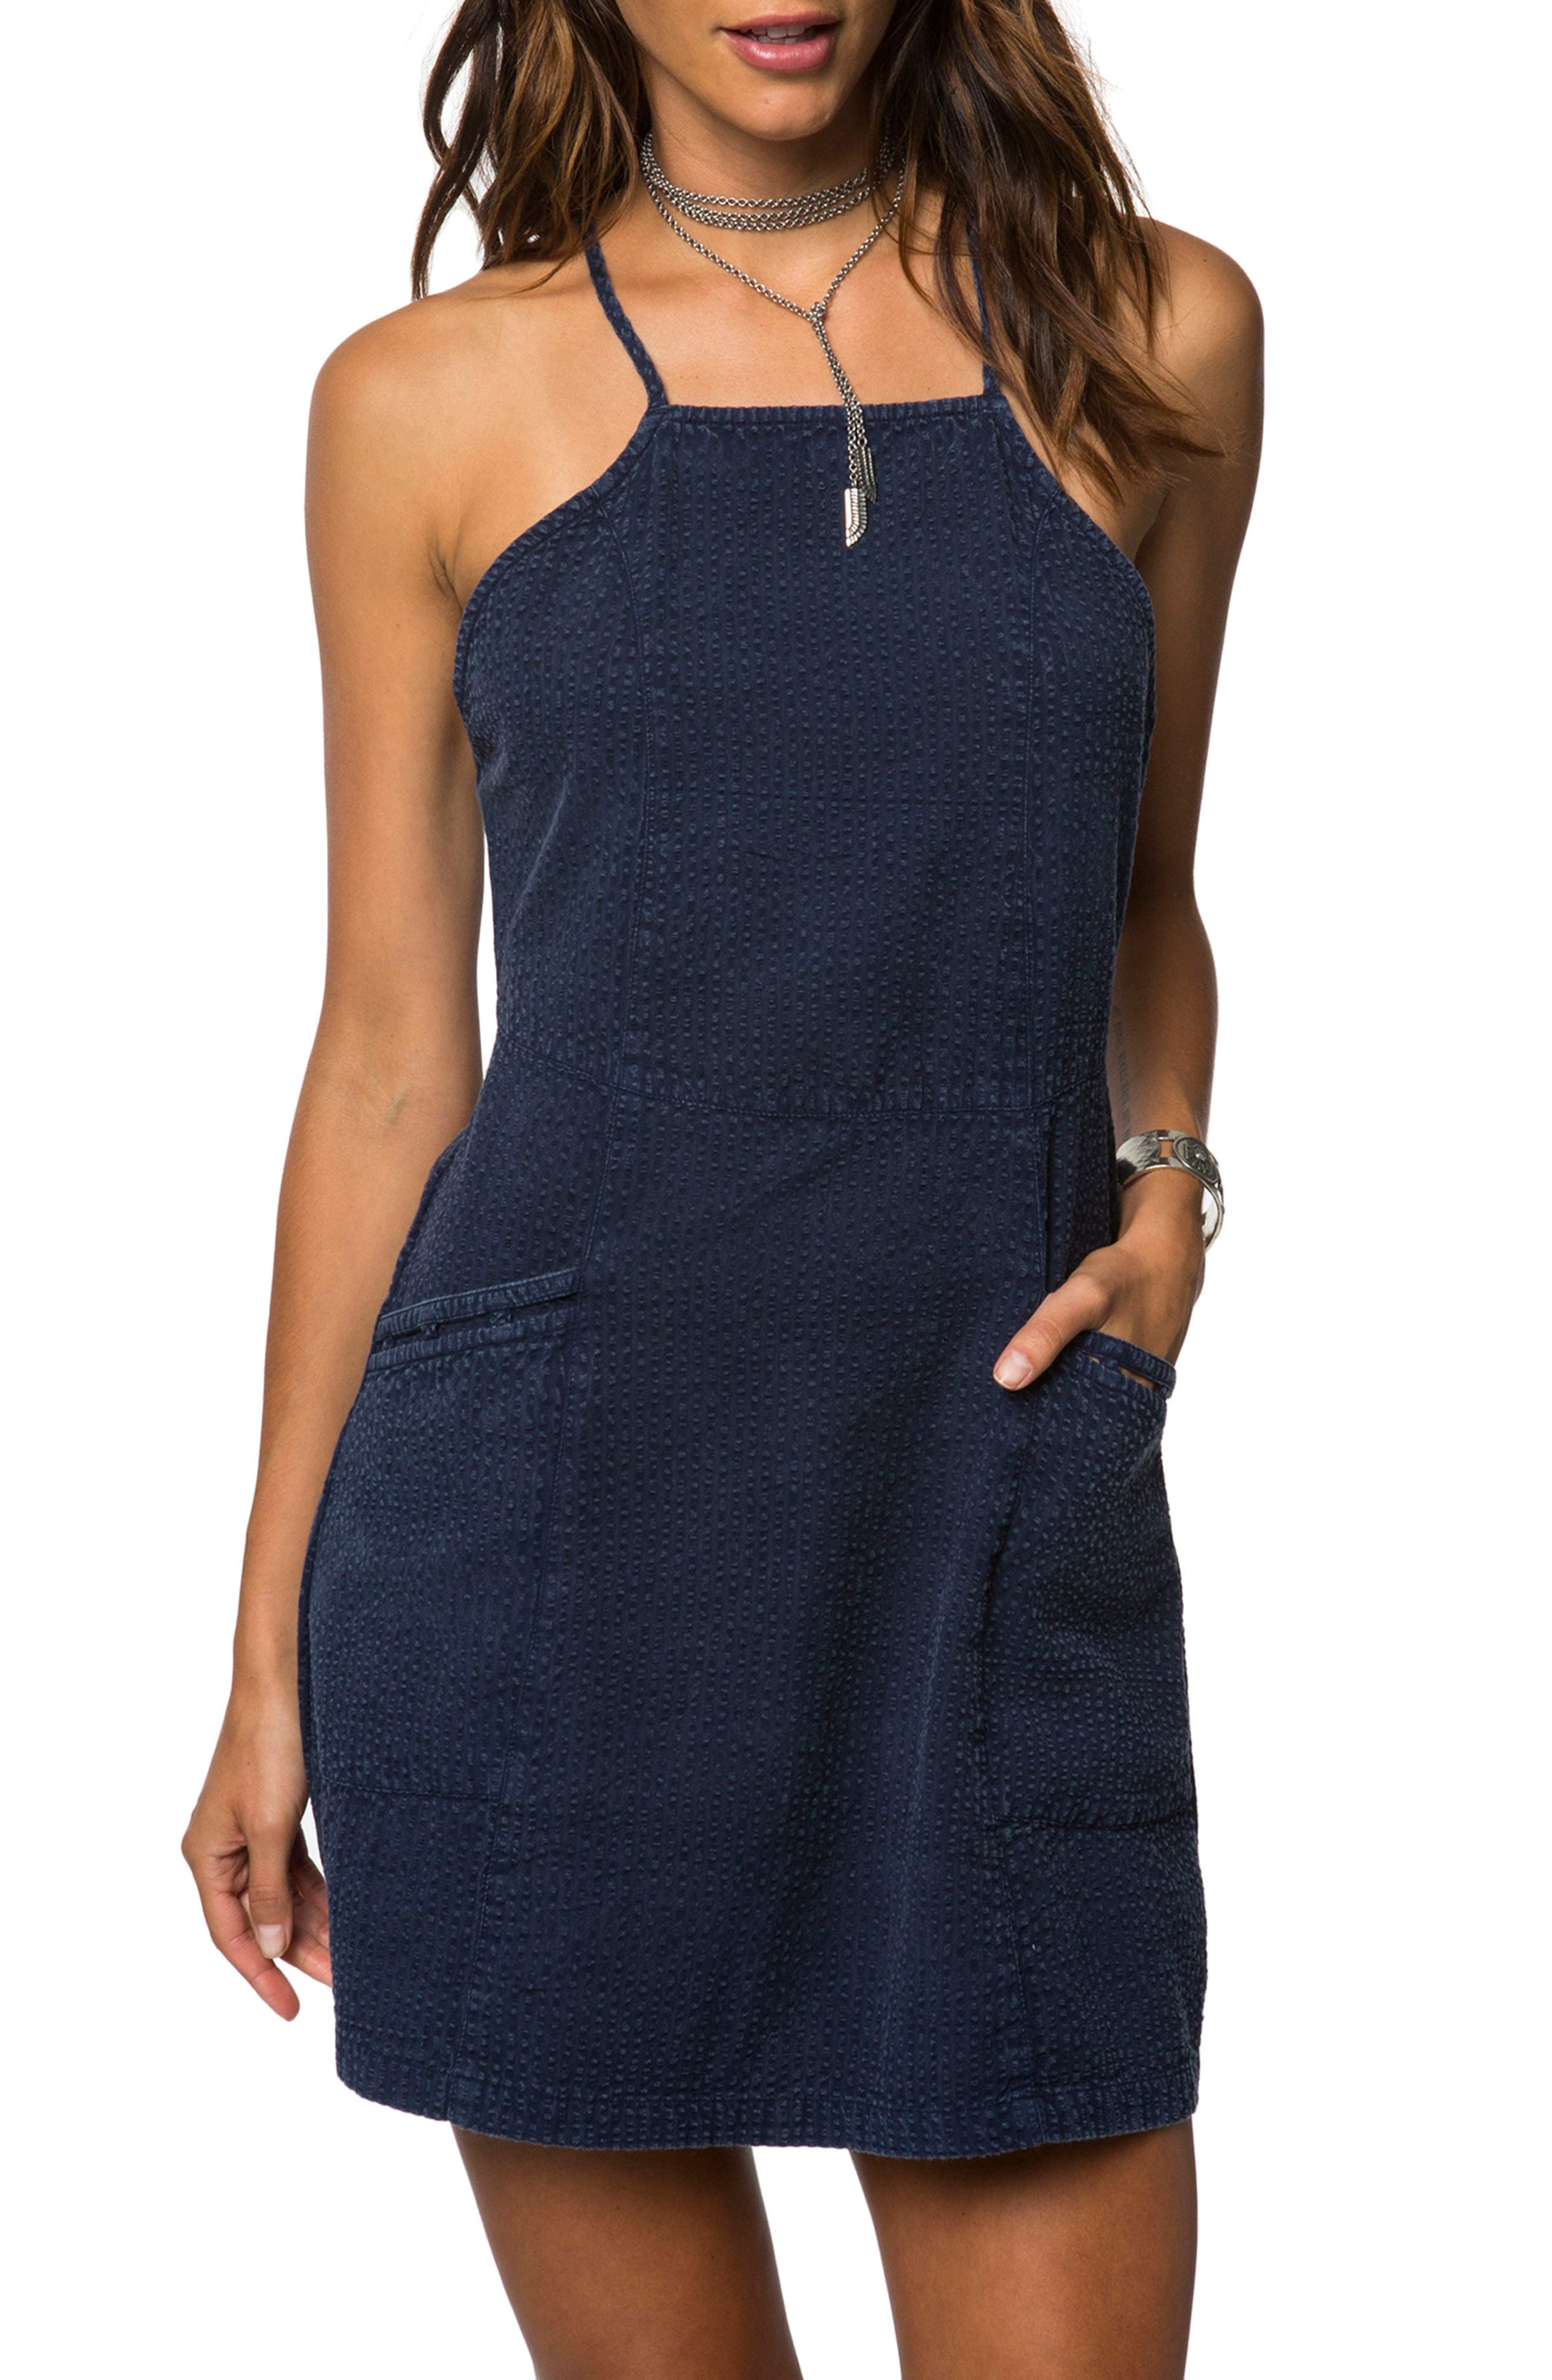 Esme Seersucker Apron Dress,                         Main,                         color, Evening Blue